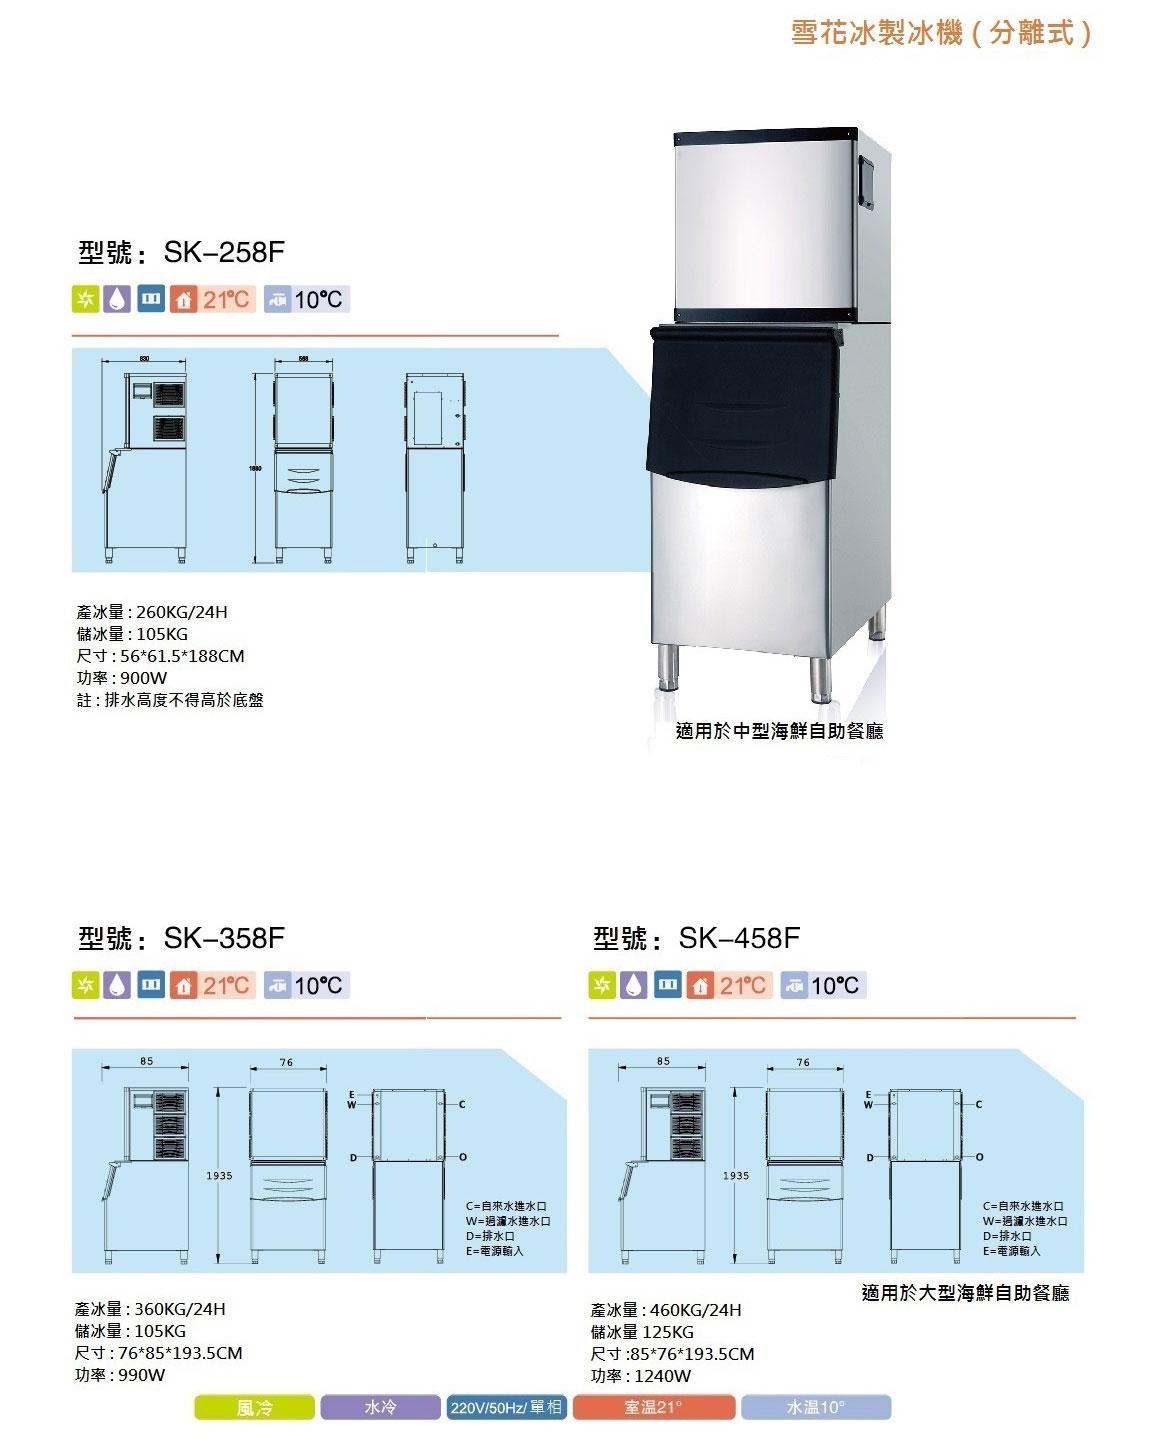 【SK-258F】碎冰製冰機-適用海鮮自助餐廳